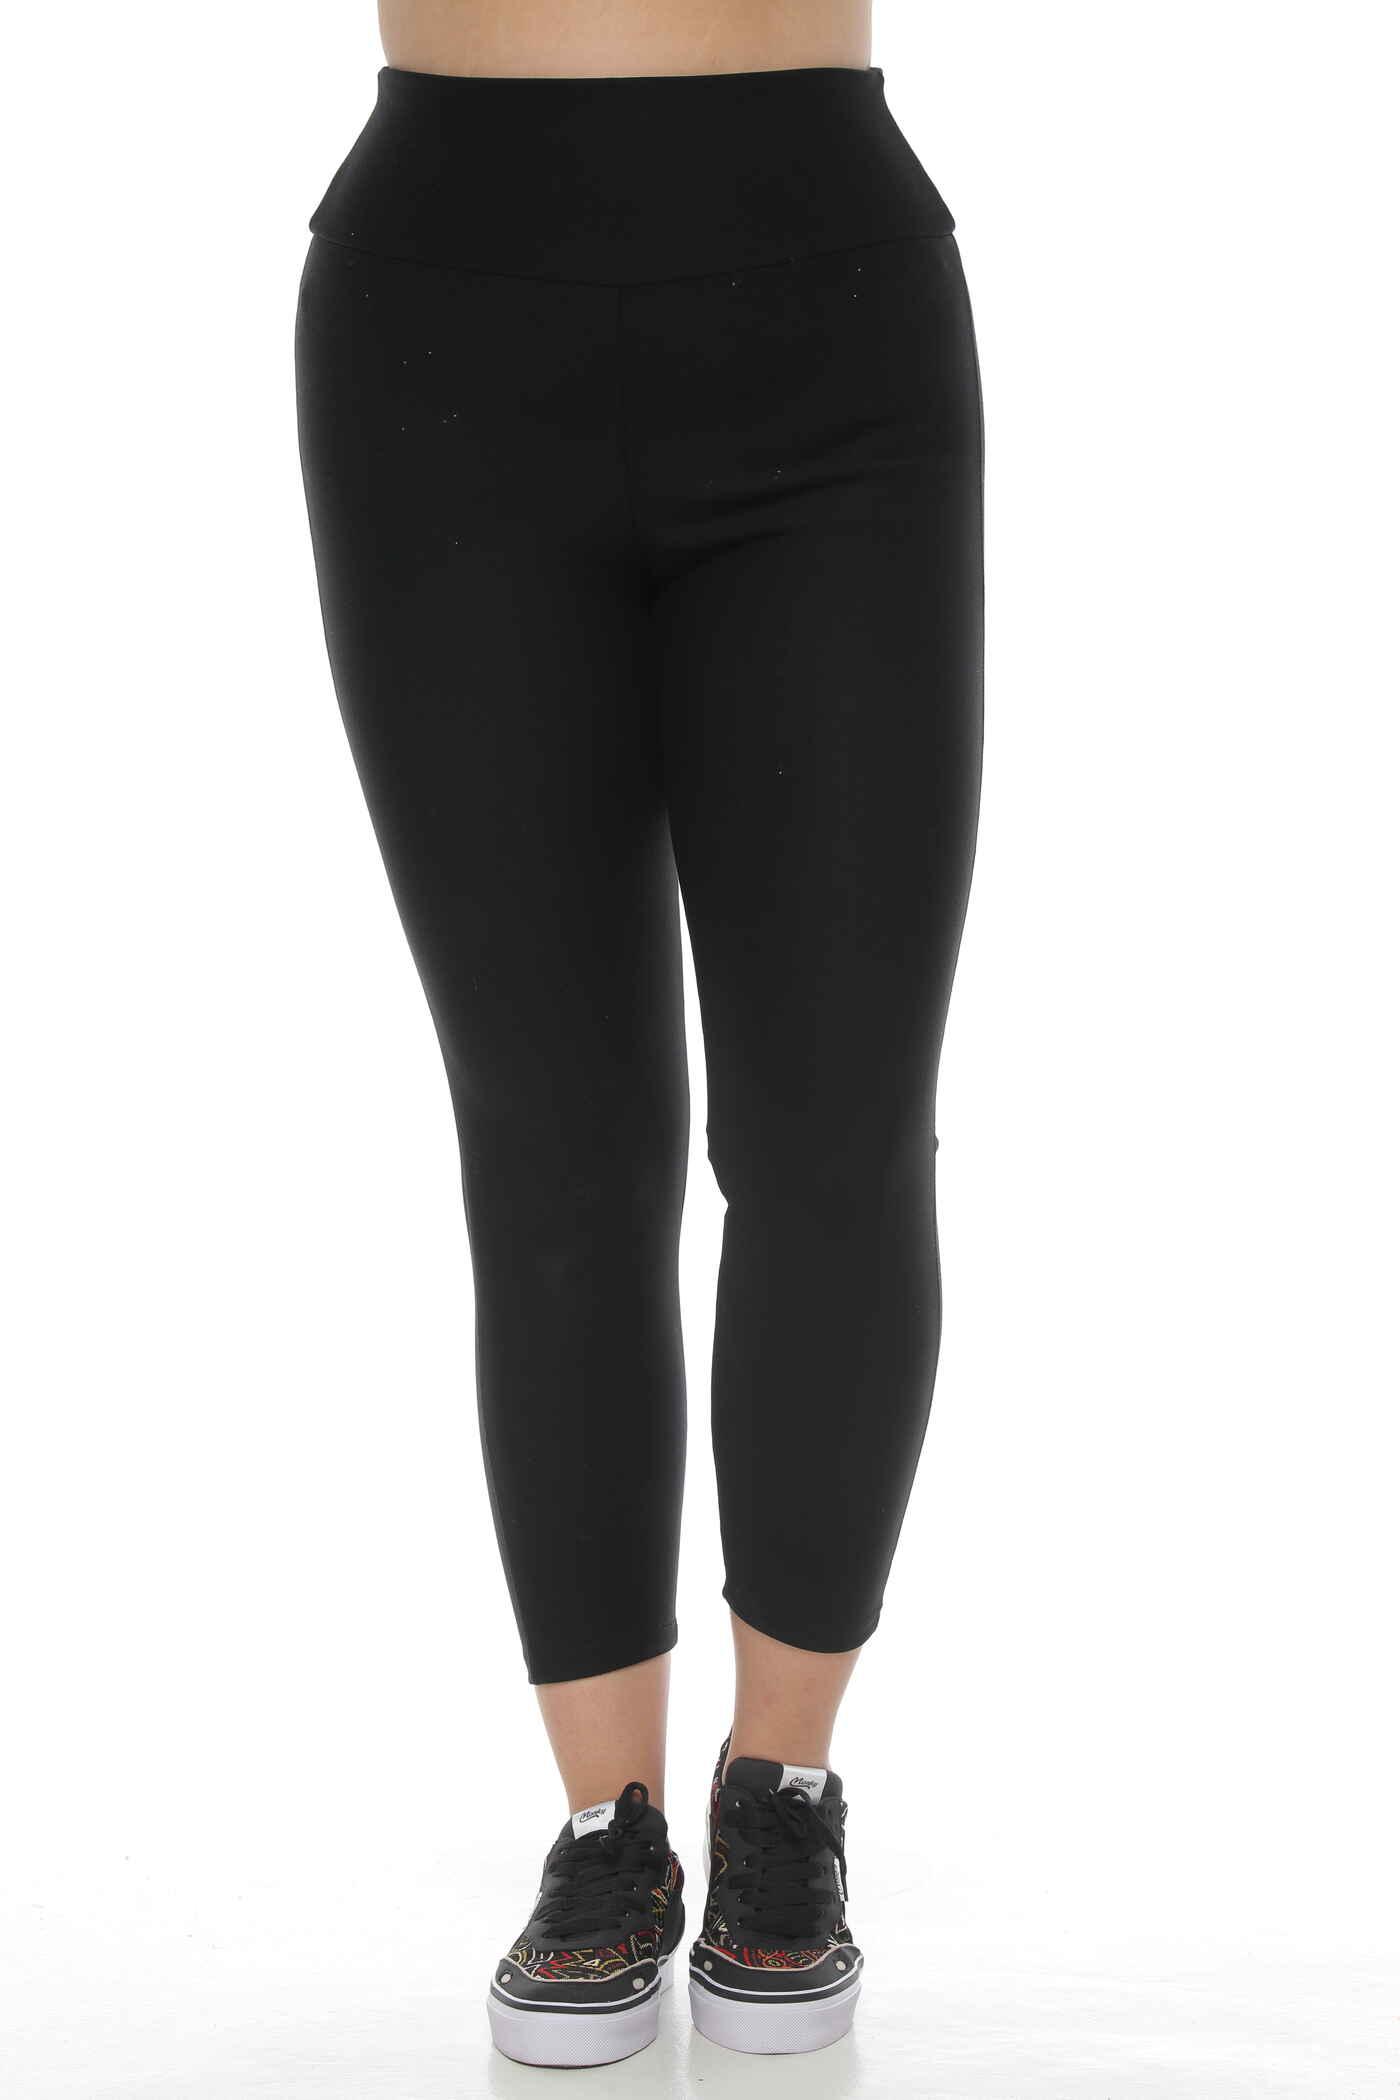 Pantalon Pluss Dama   240420